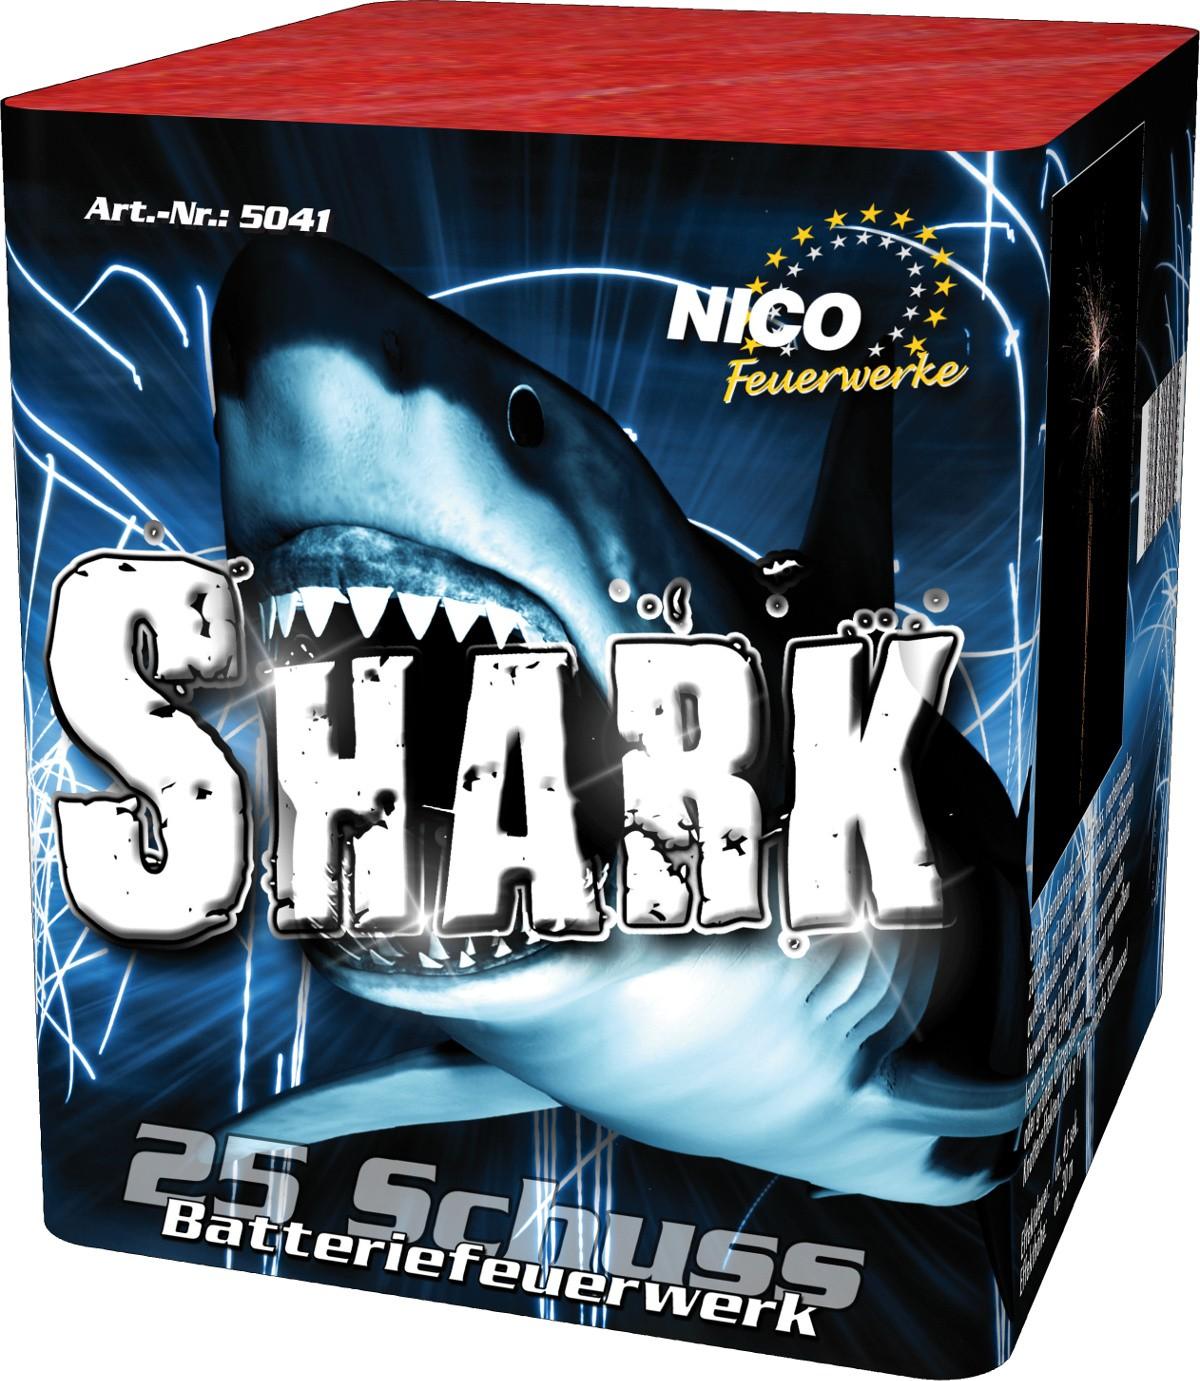 Batteriefeuerwerk Shark 25 Schuss